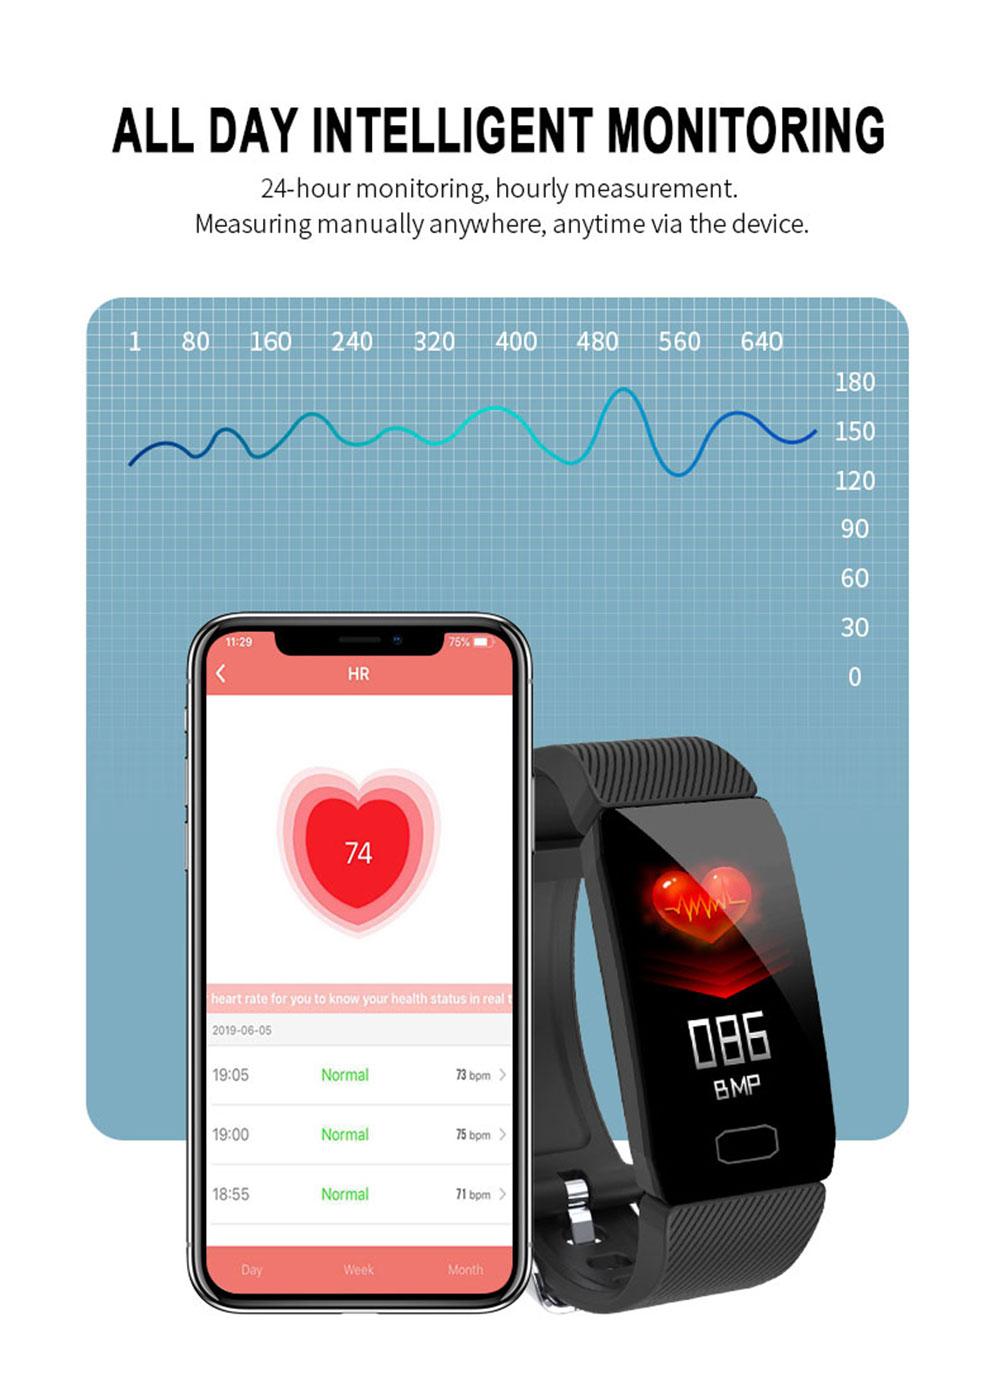 H79470fb47c79433a9d748525a3bdedd8L Fitness Bracelet Blood Pressure 1.14'' Screen Fitness Tracker Smart Watch Waterproof Smart Wristband Weather Display Women Men